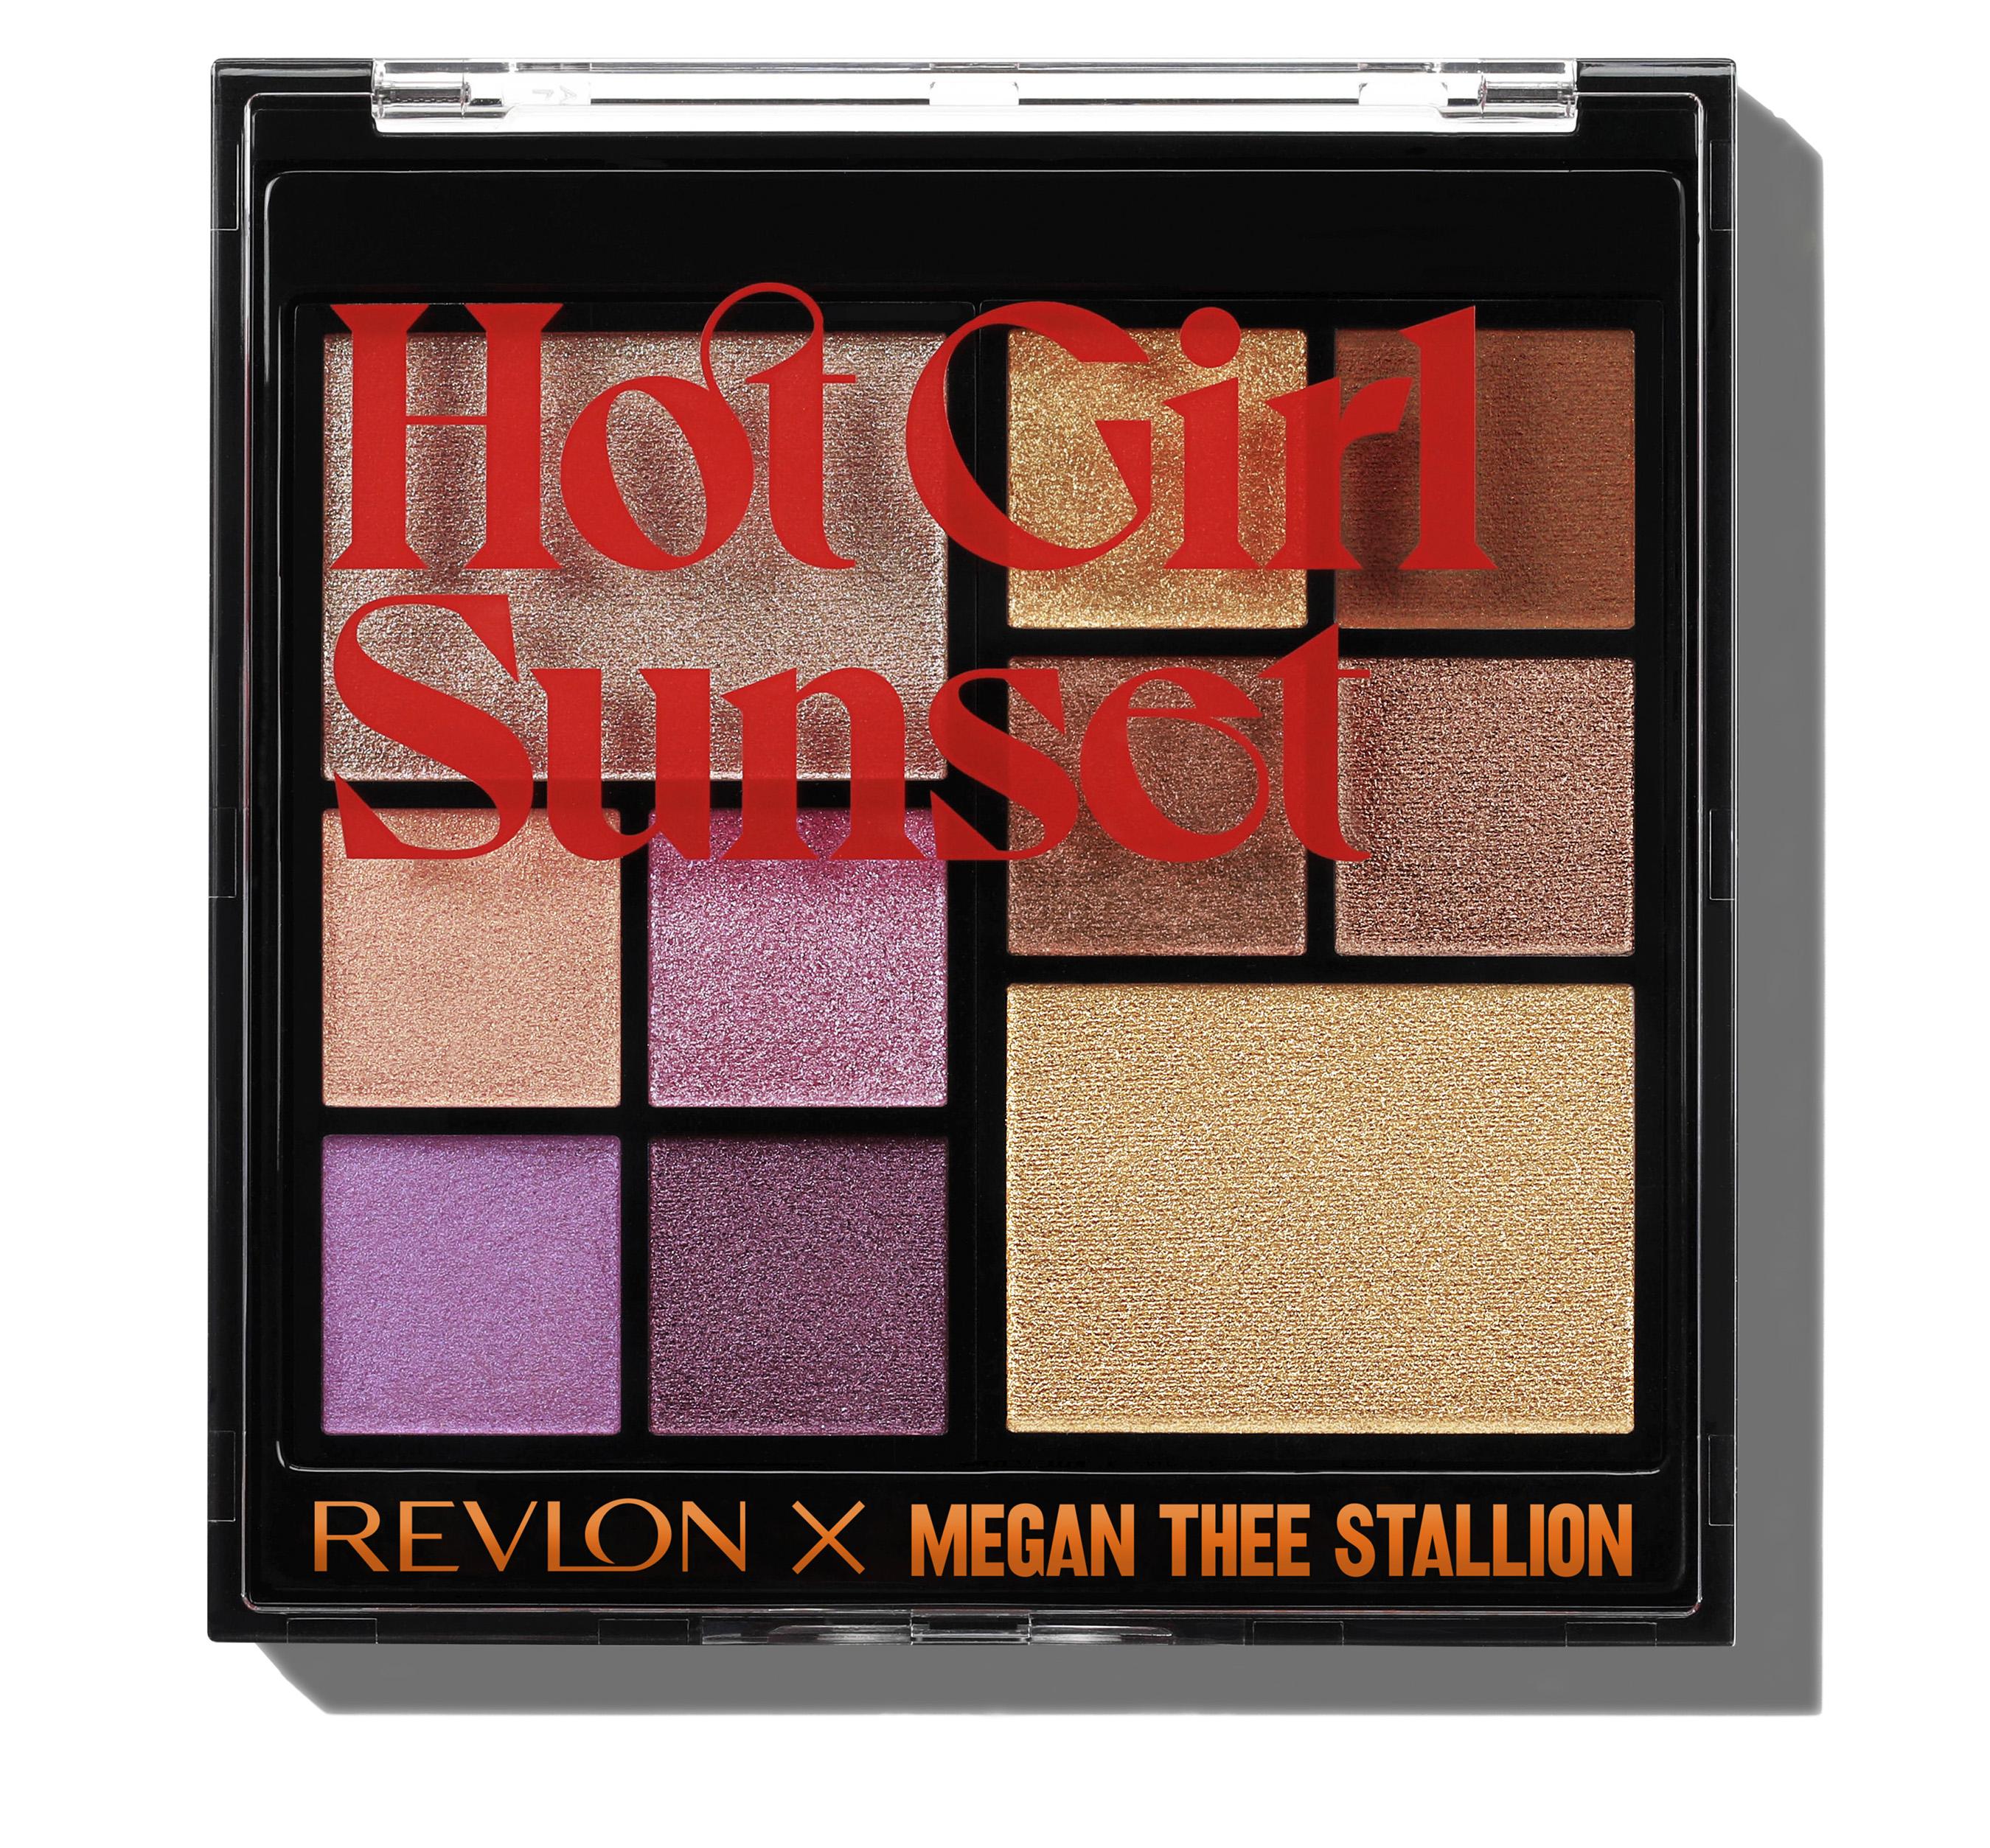 DropX Exclusive Revlon x Megan Thee Stallion Hot Girl Sunset Palette